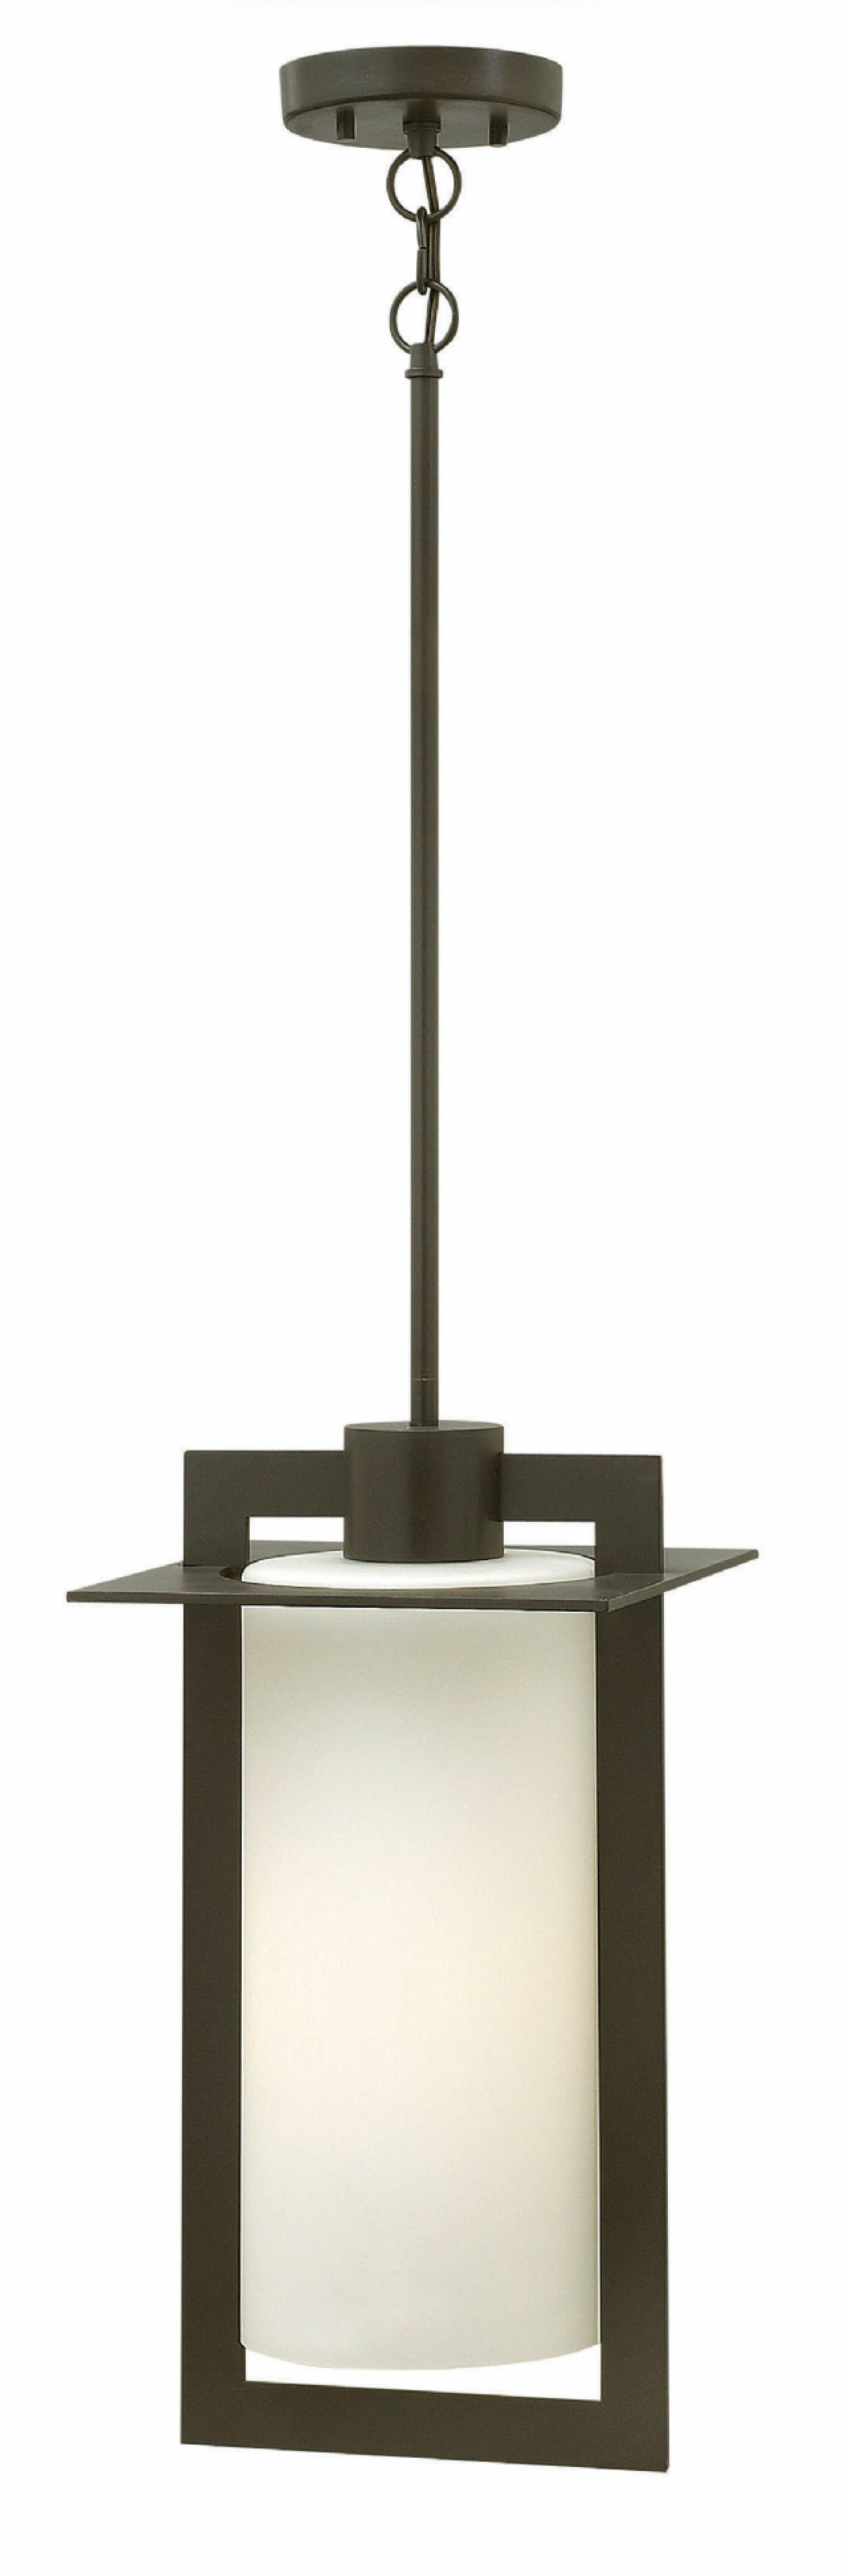 Orren Ellis Apex 1 Bulb 18 8 H Mains Only Outdoor Hanging Lantern Reviews Wayfair